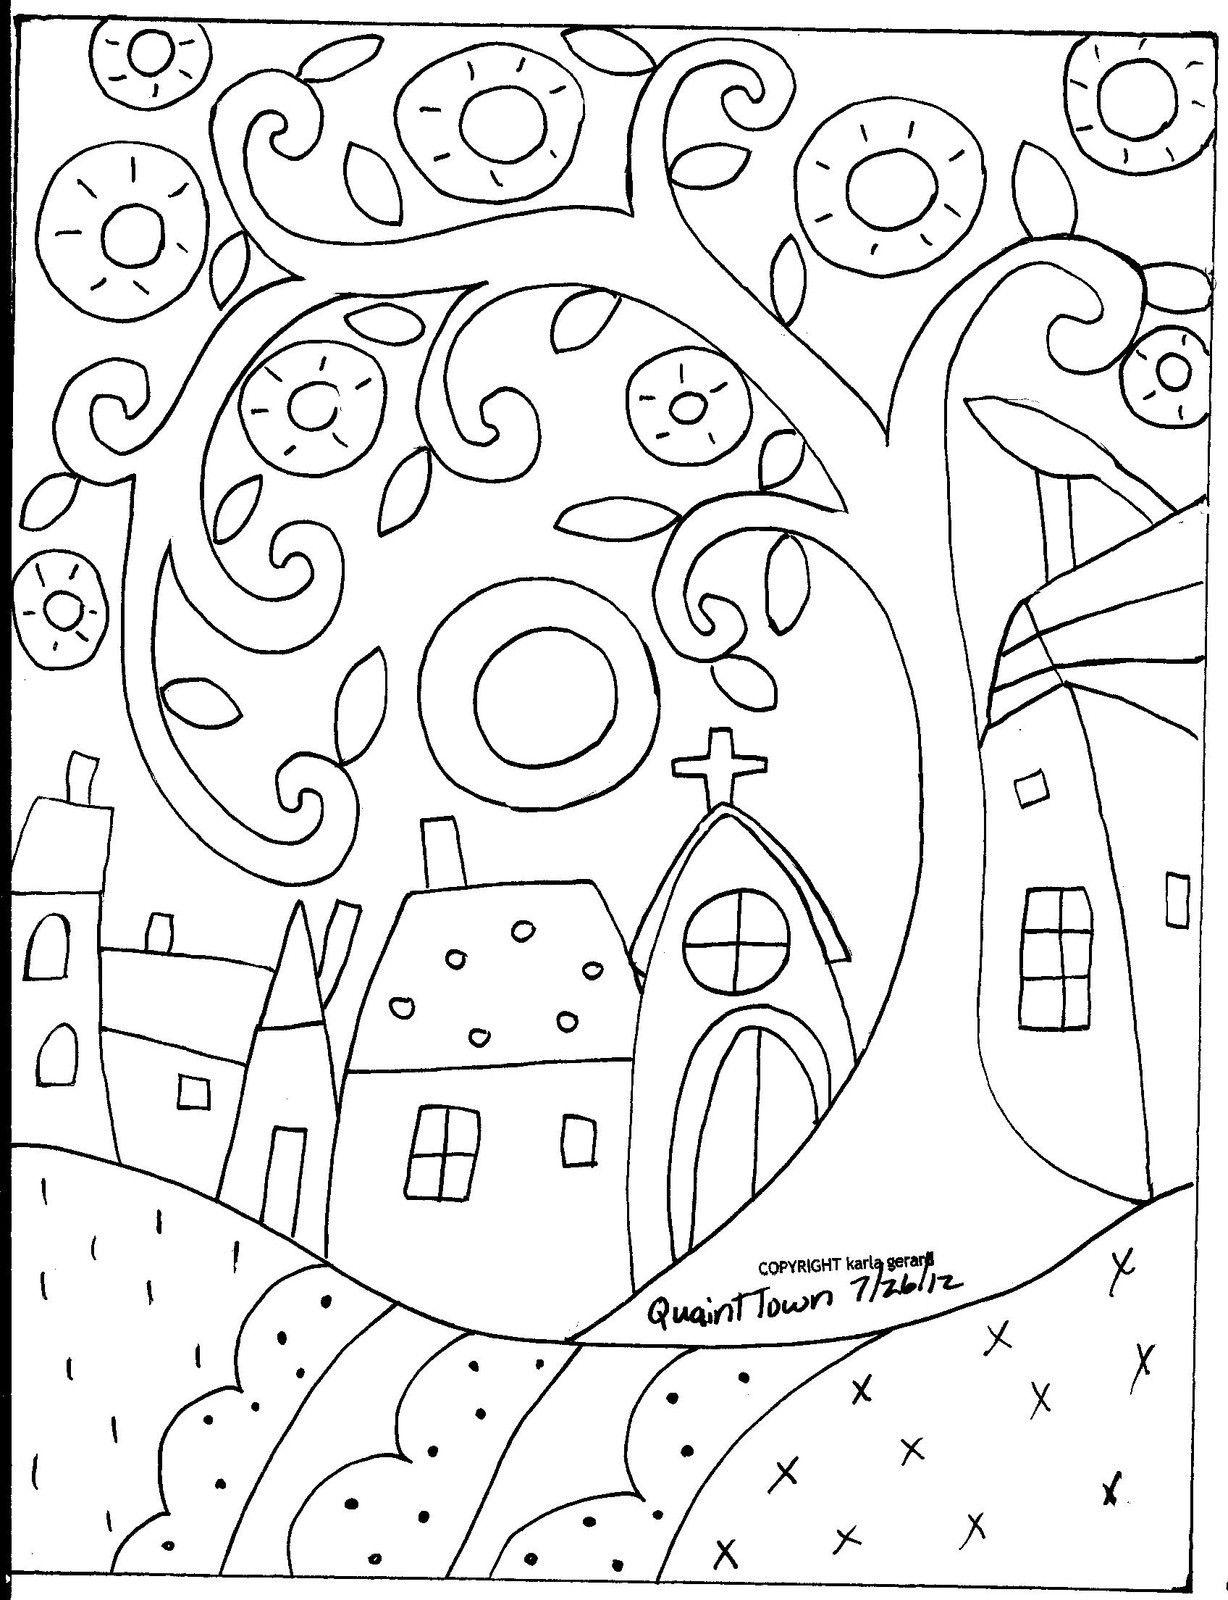 Details About Rug Hooking Paper Pattern Quaint Town Folk